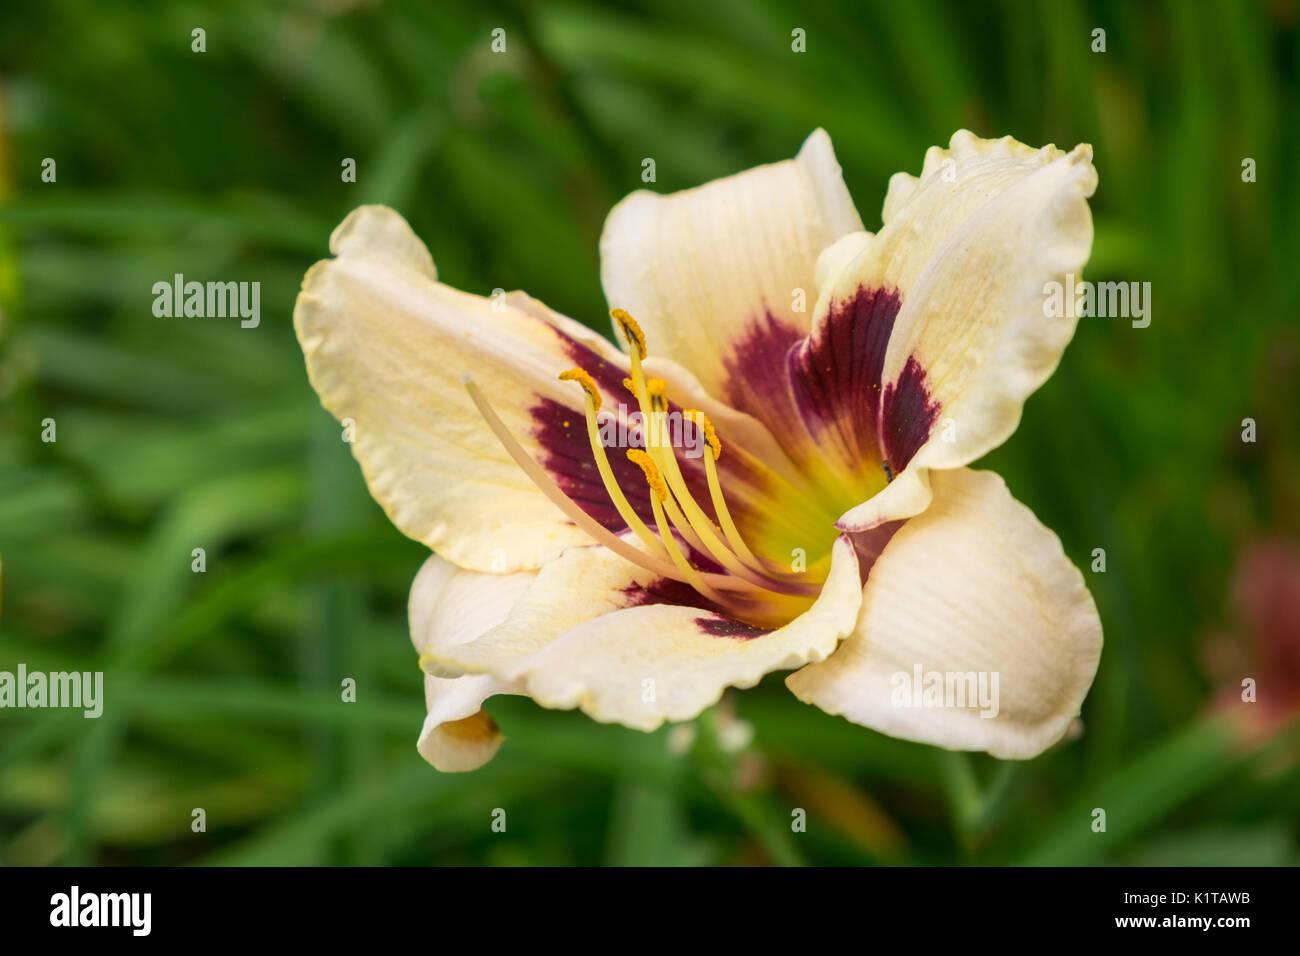 Day lily flower aka hemerocallis blooming closeup view stock photo day lily flower aka hemerocallis blooming closeup view izmirmasajfo Images